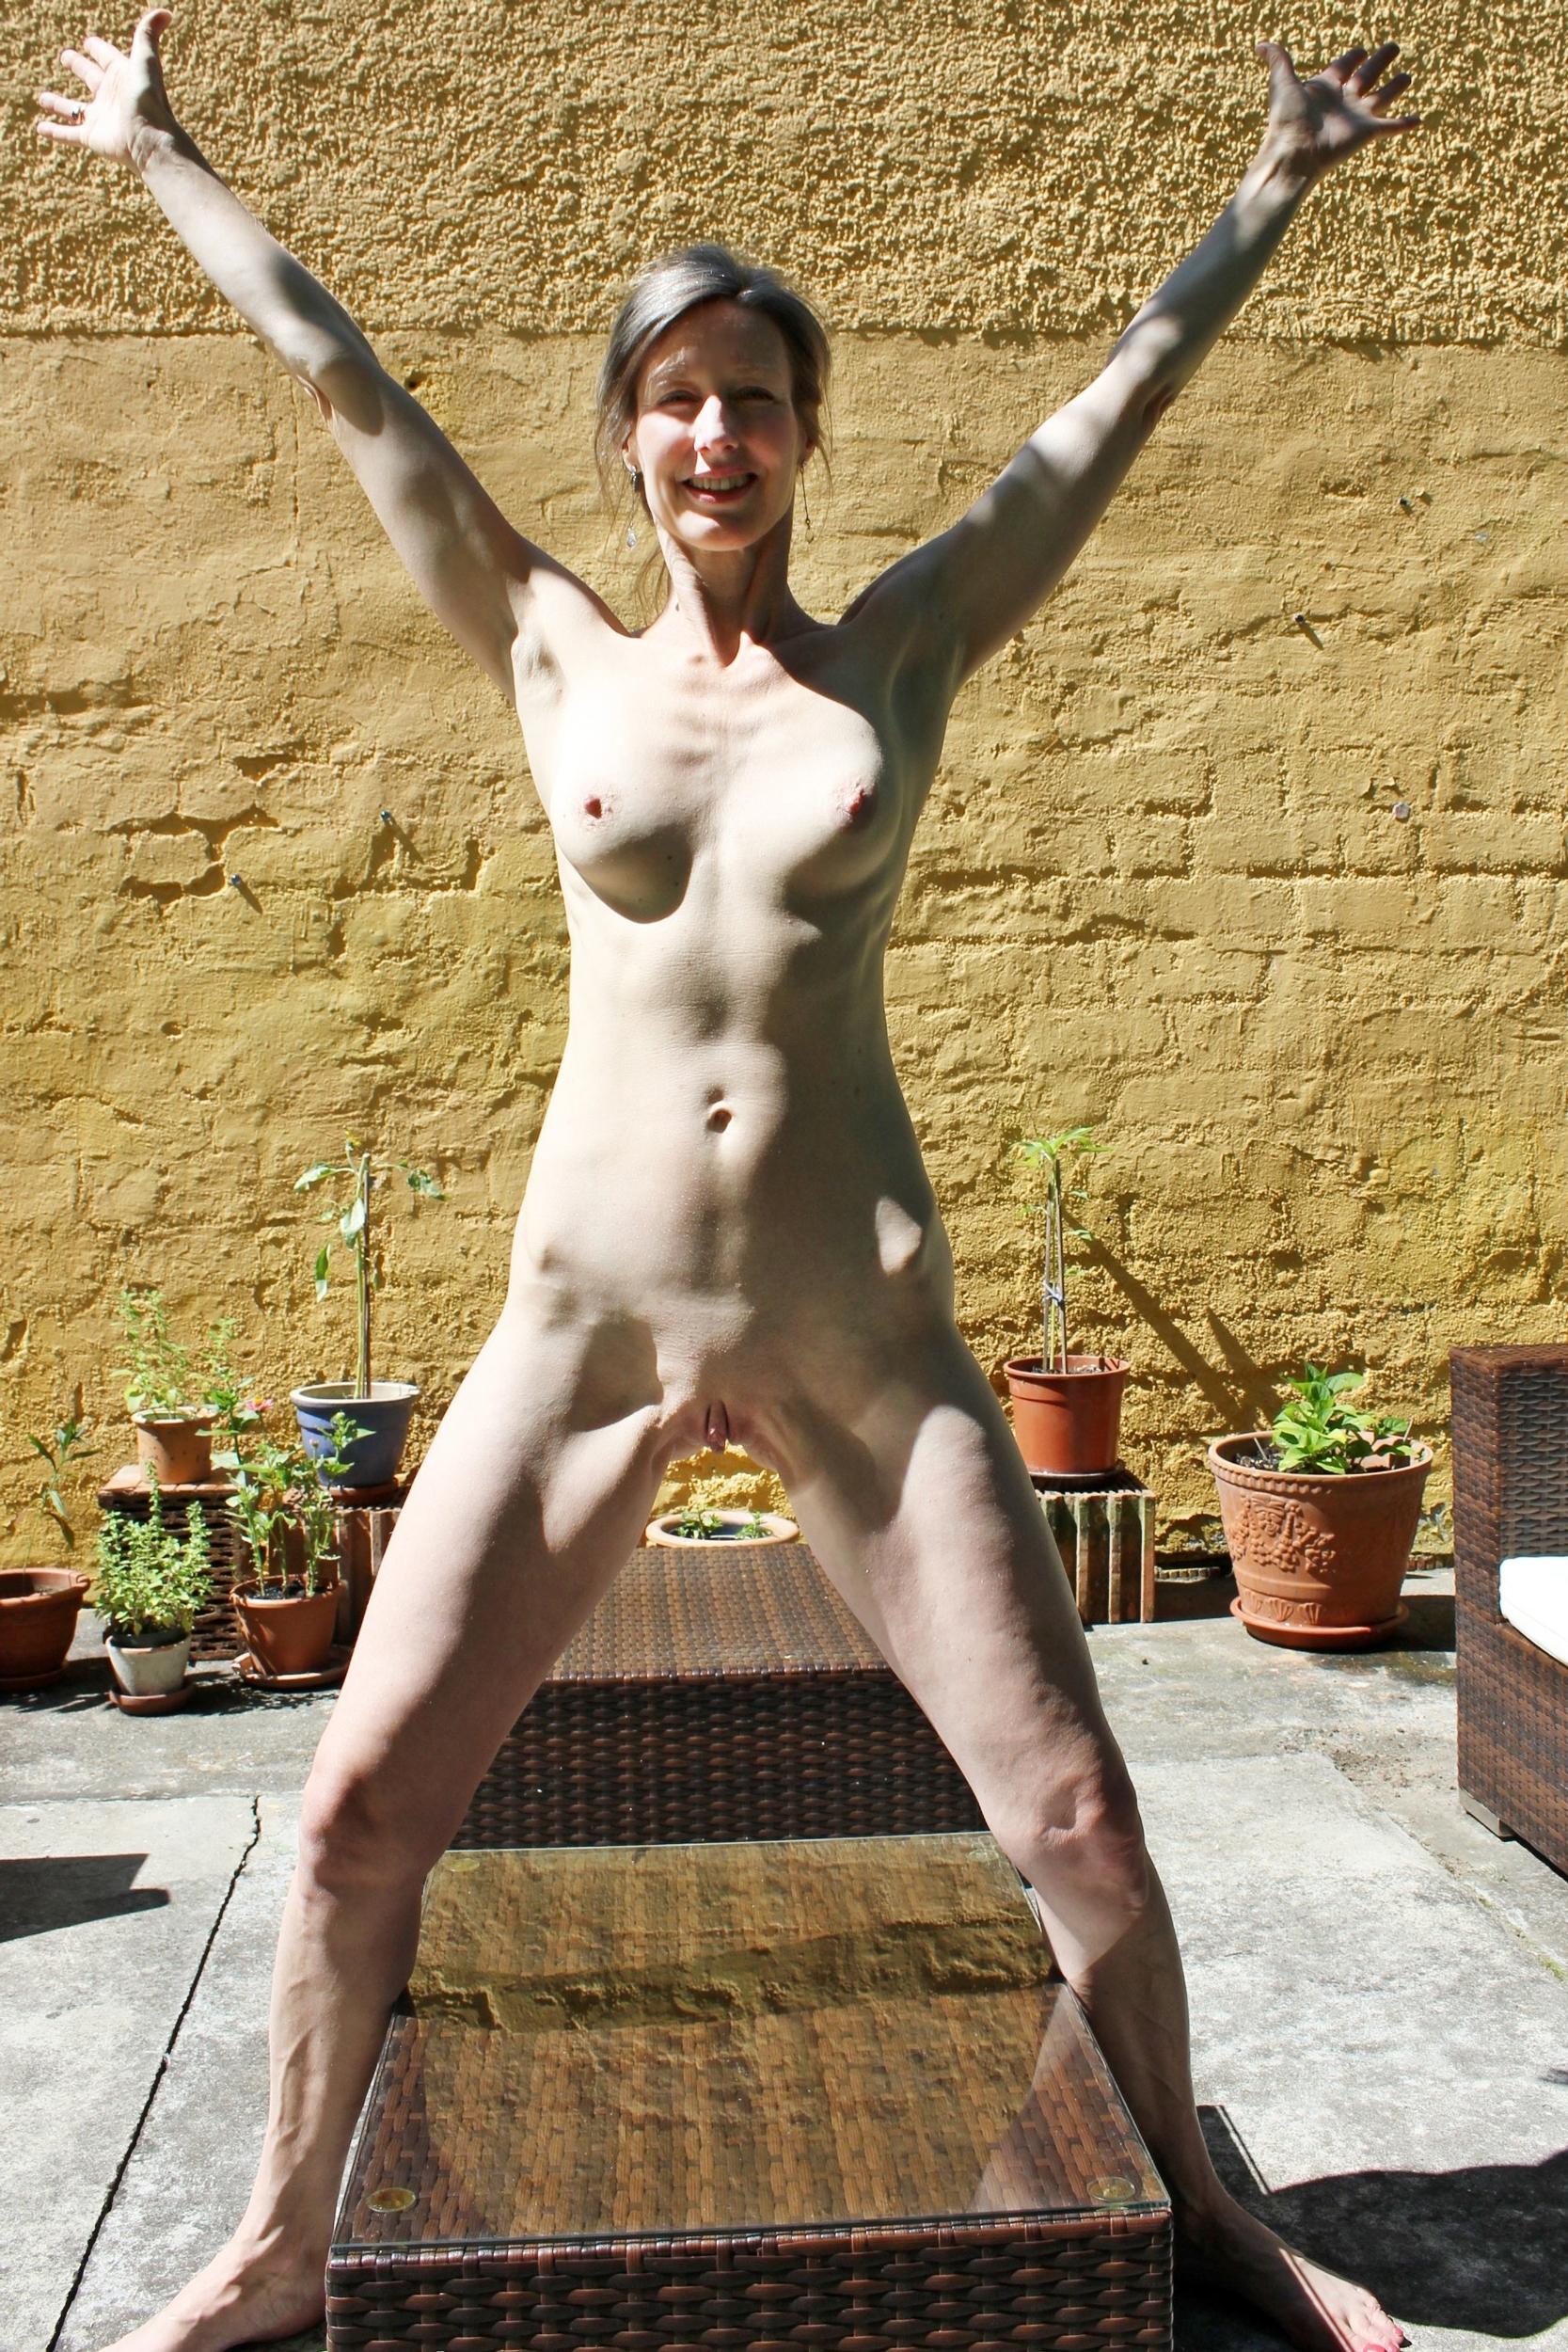 mature anal gaping pics